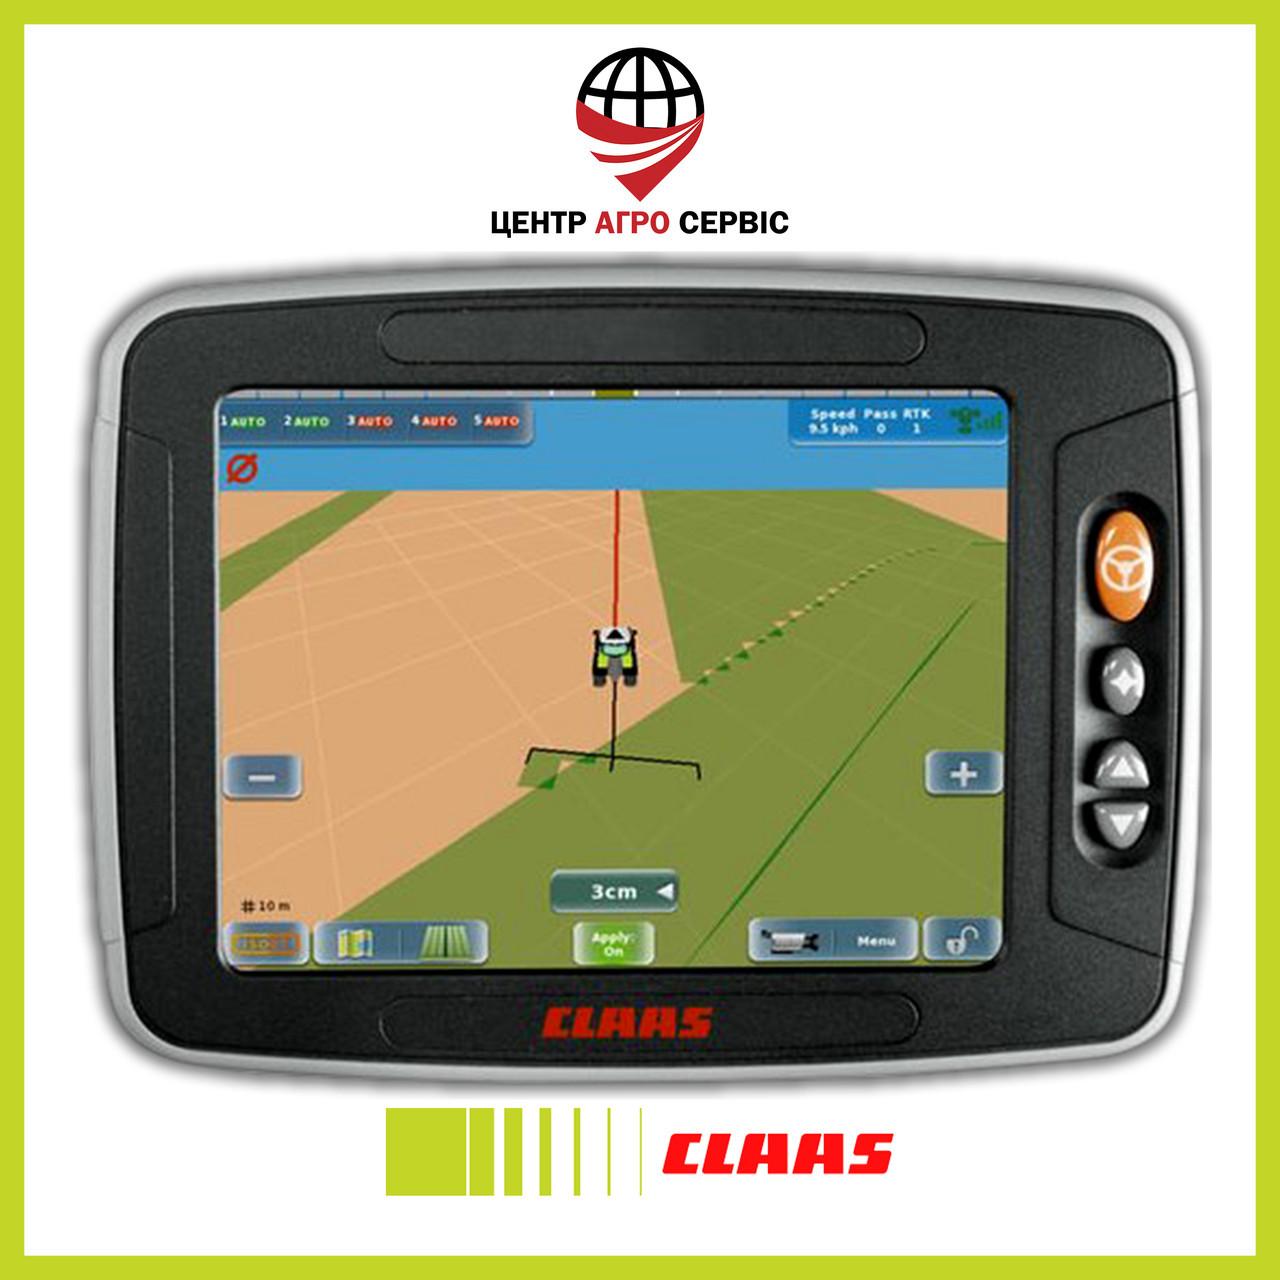 Gps навигатор для трактора (навигатор для поля, сельхоз навигатор)  CLAAS gps copilot s10